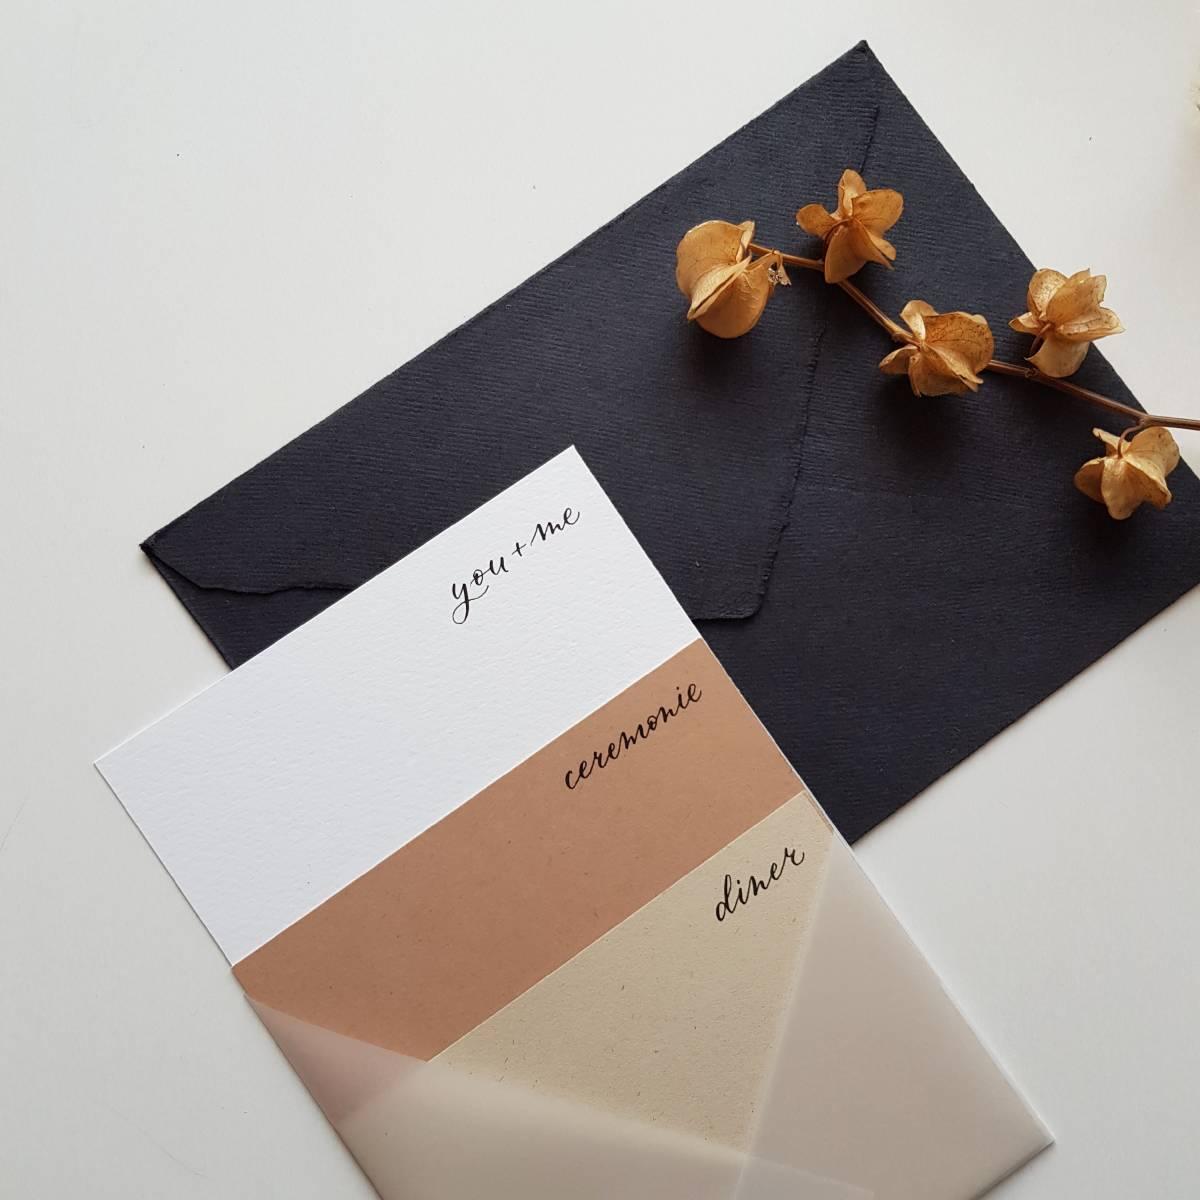 Touch of Gold - Trouwuitnodiging - Huwelijksuitnodiging - Kalligrafie - House of Weddings - 18